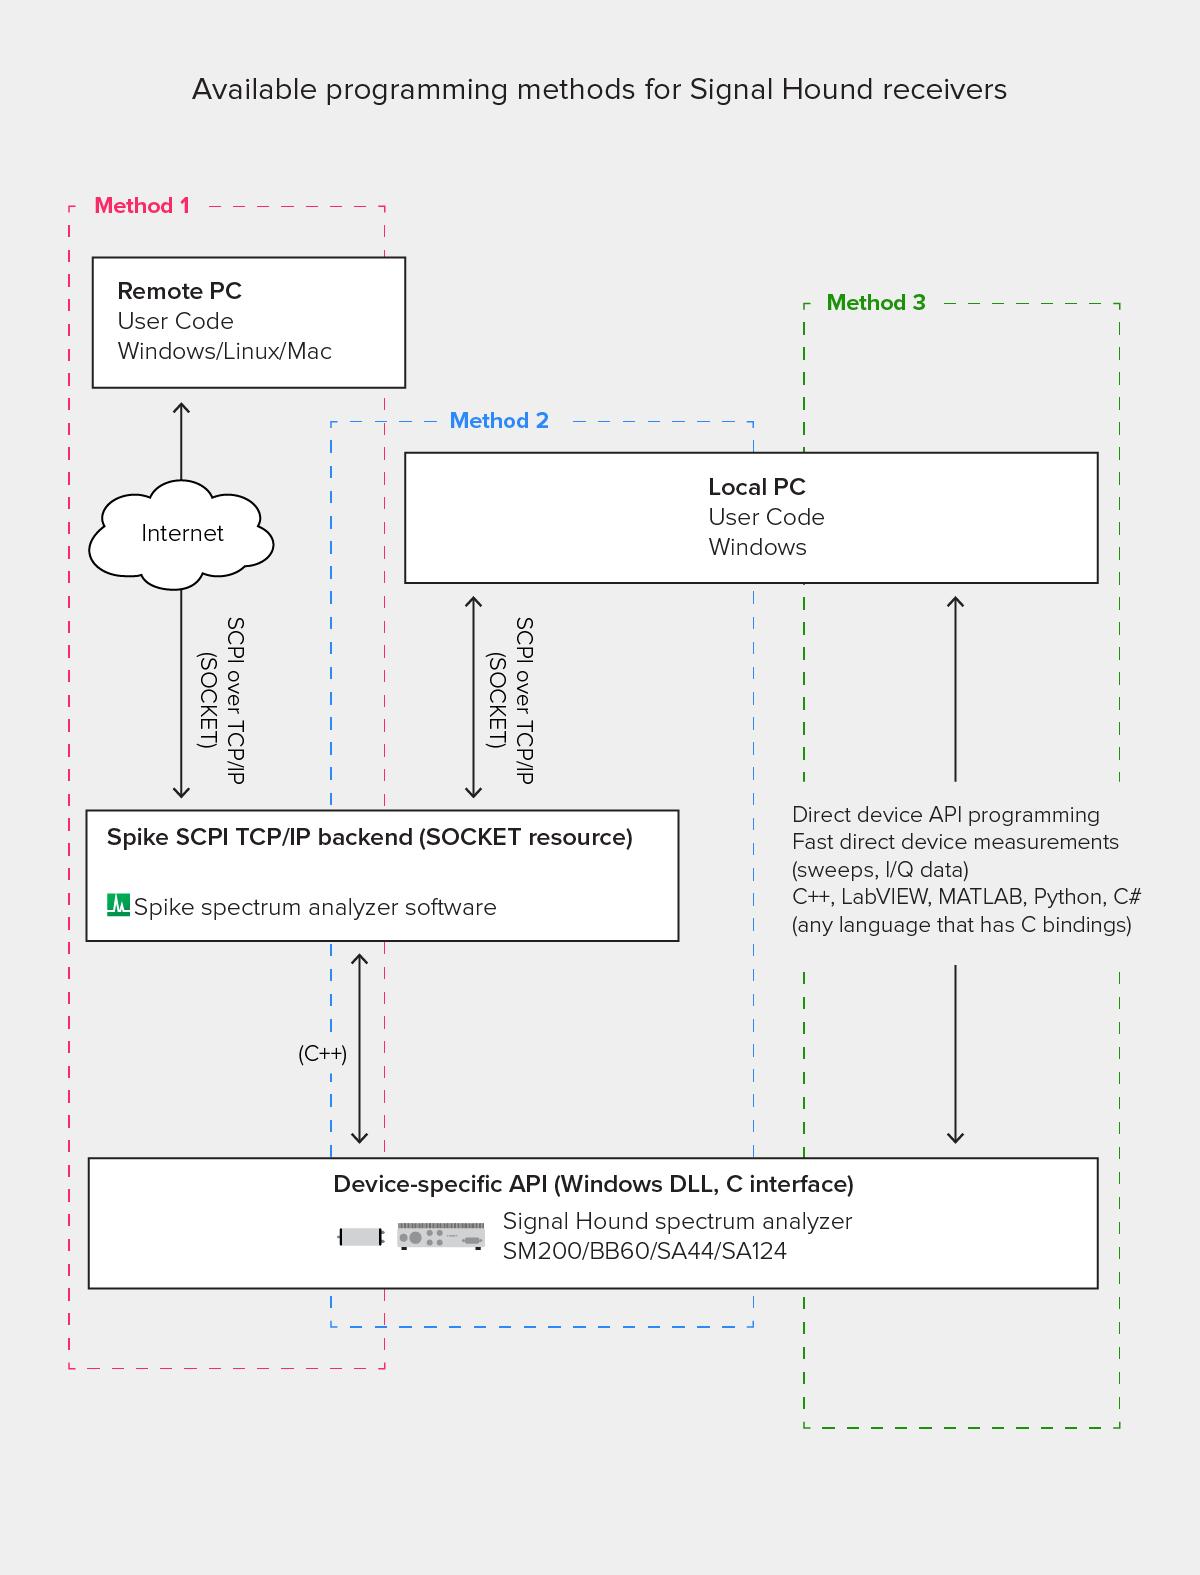 chart showing three ways of programming a Signal Hound